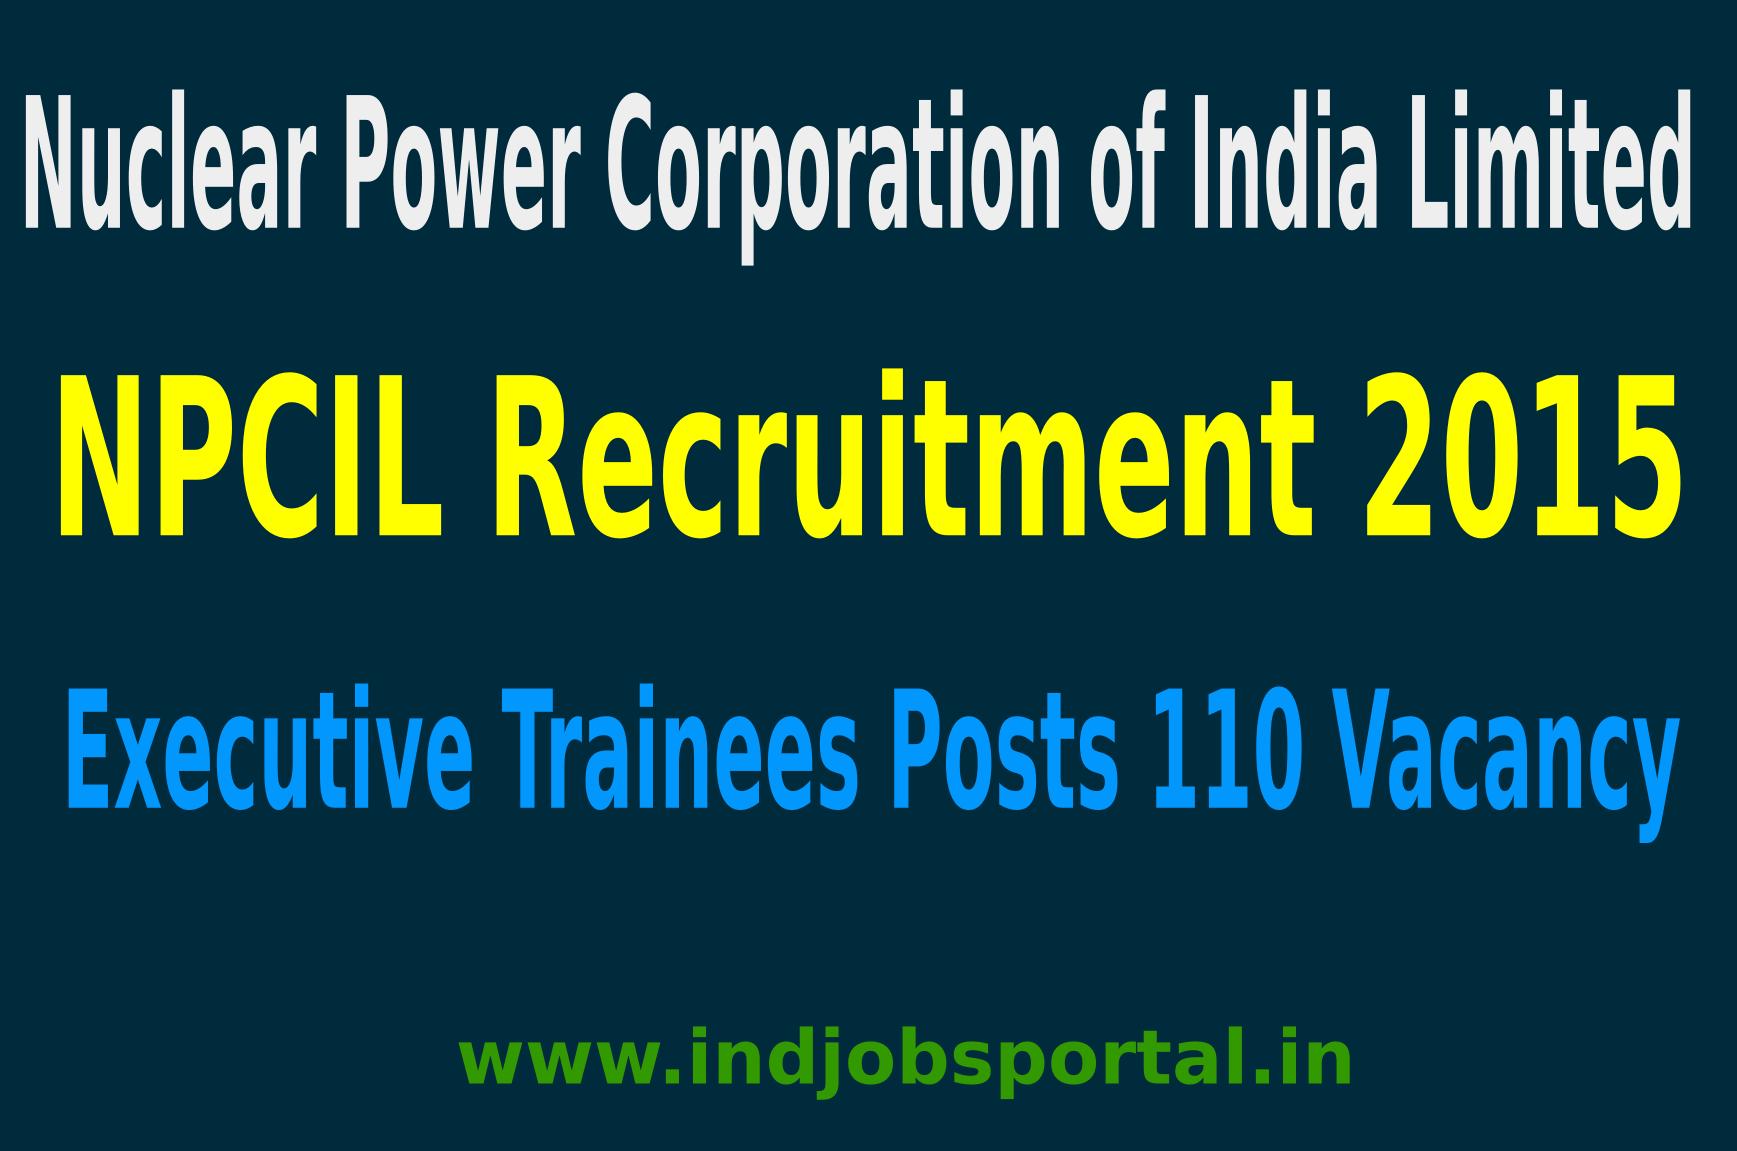 NPCIL Recruitment 2015 Online Application For 110 Executive Trainees Posts